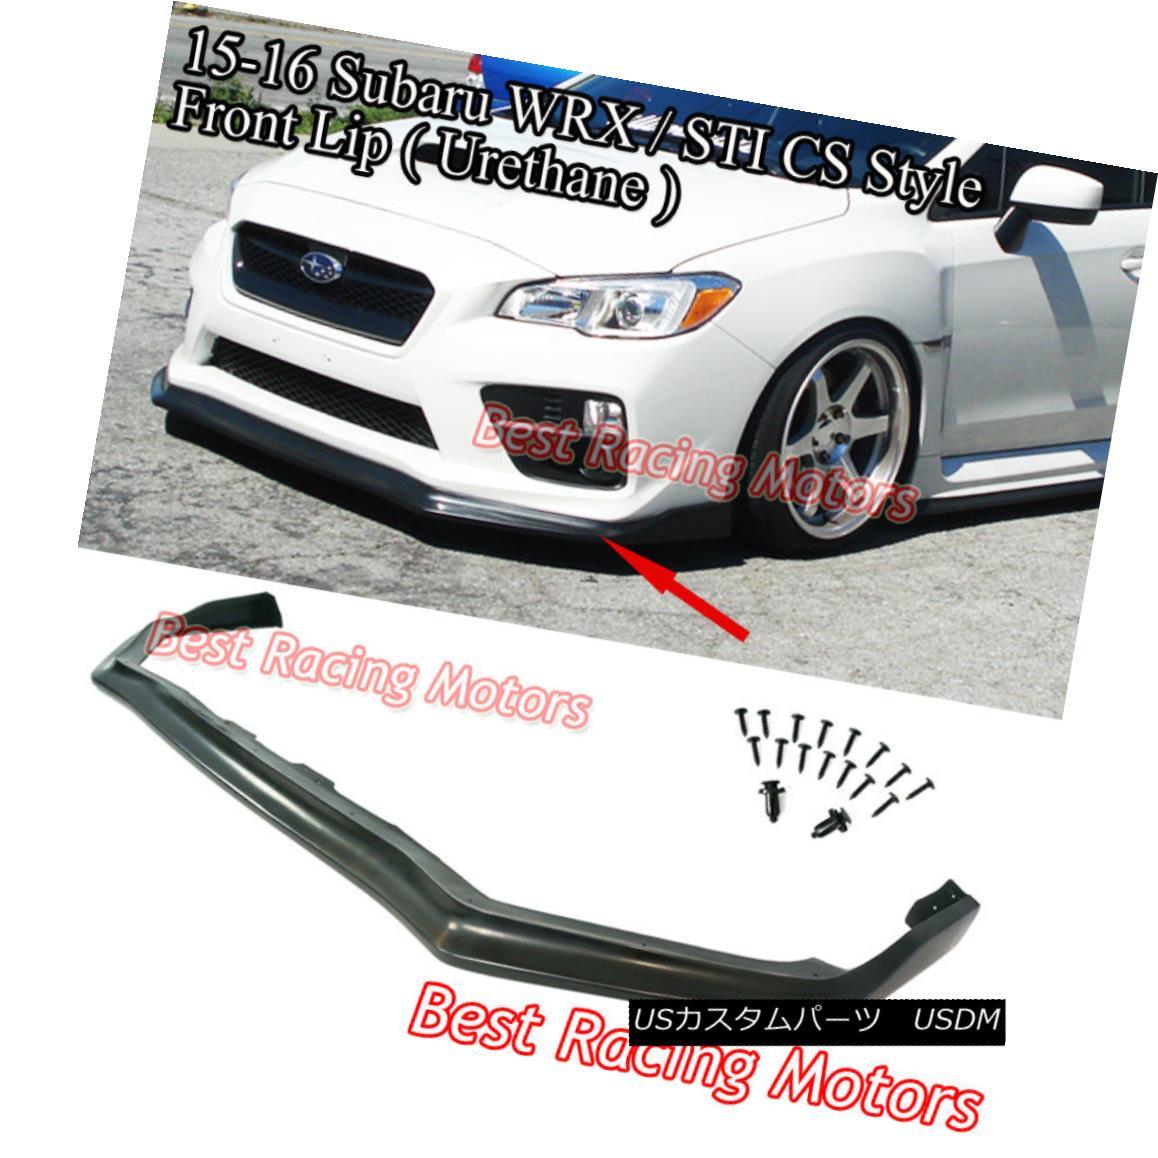 Fits For 15-17 Subaru WRX STI CS Style Front Bumper Lip Spoiler Body Kit PU